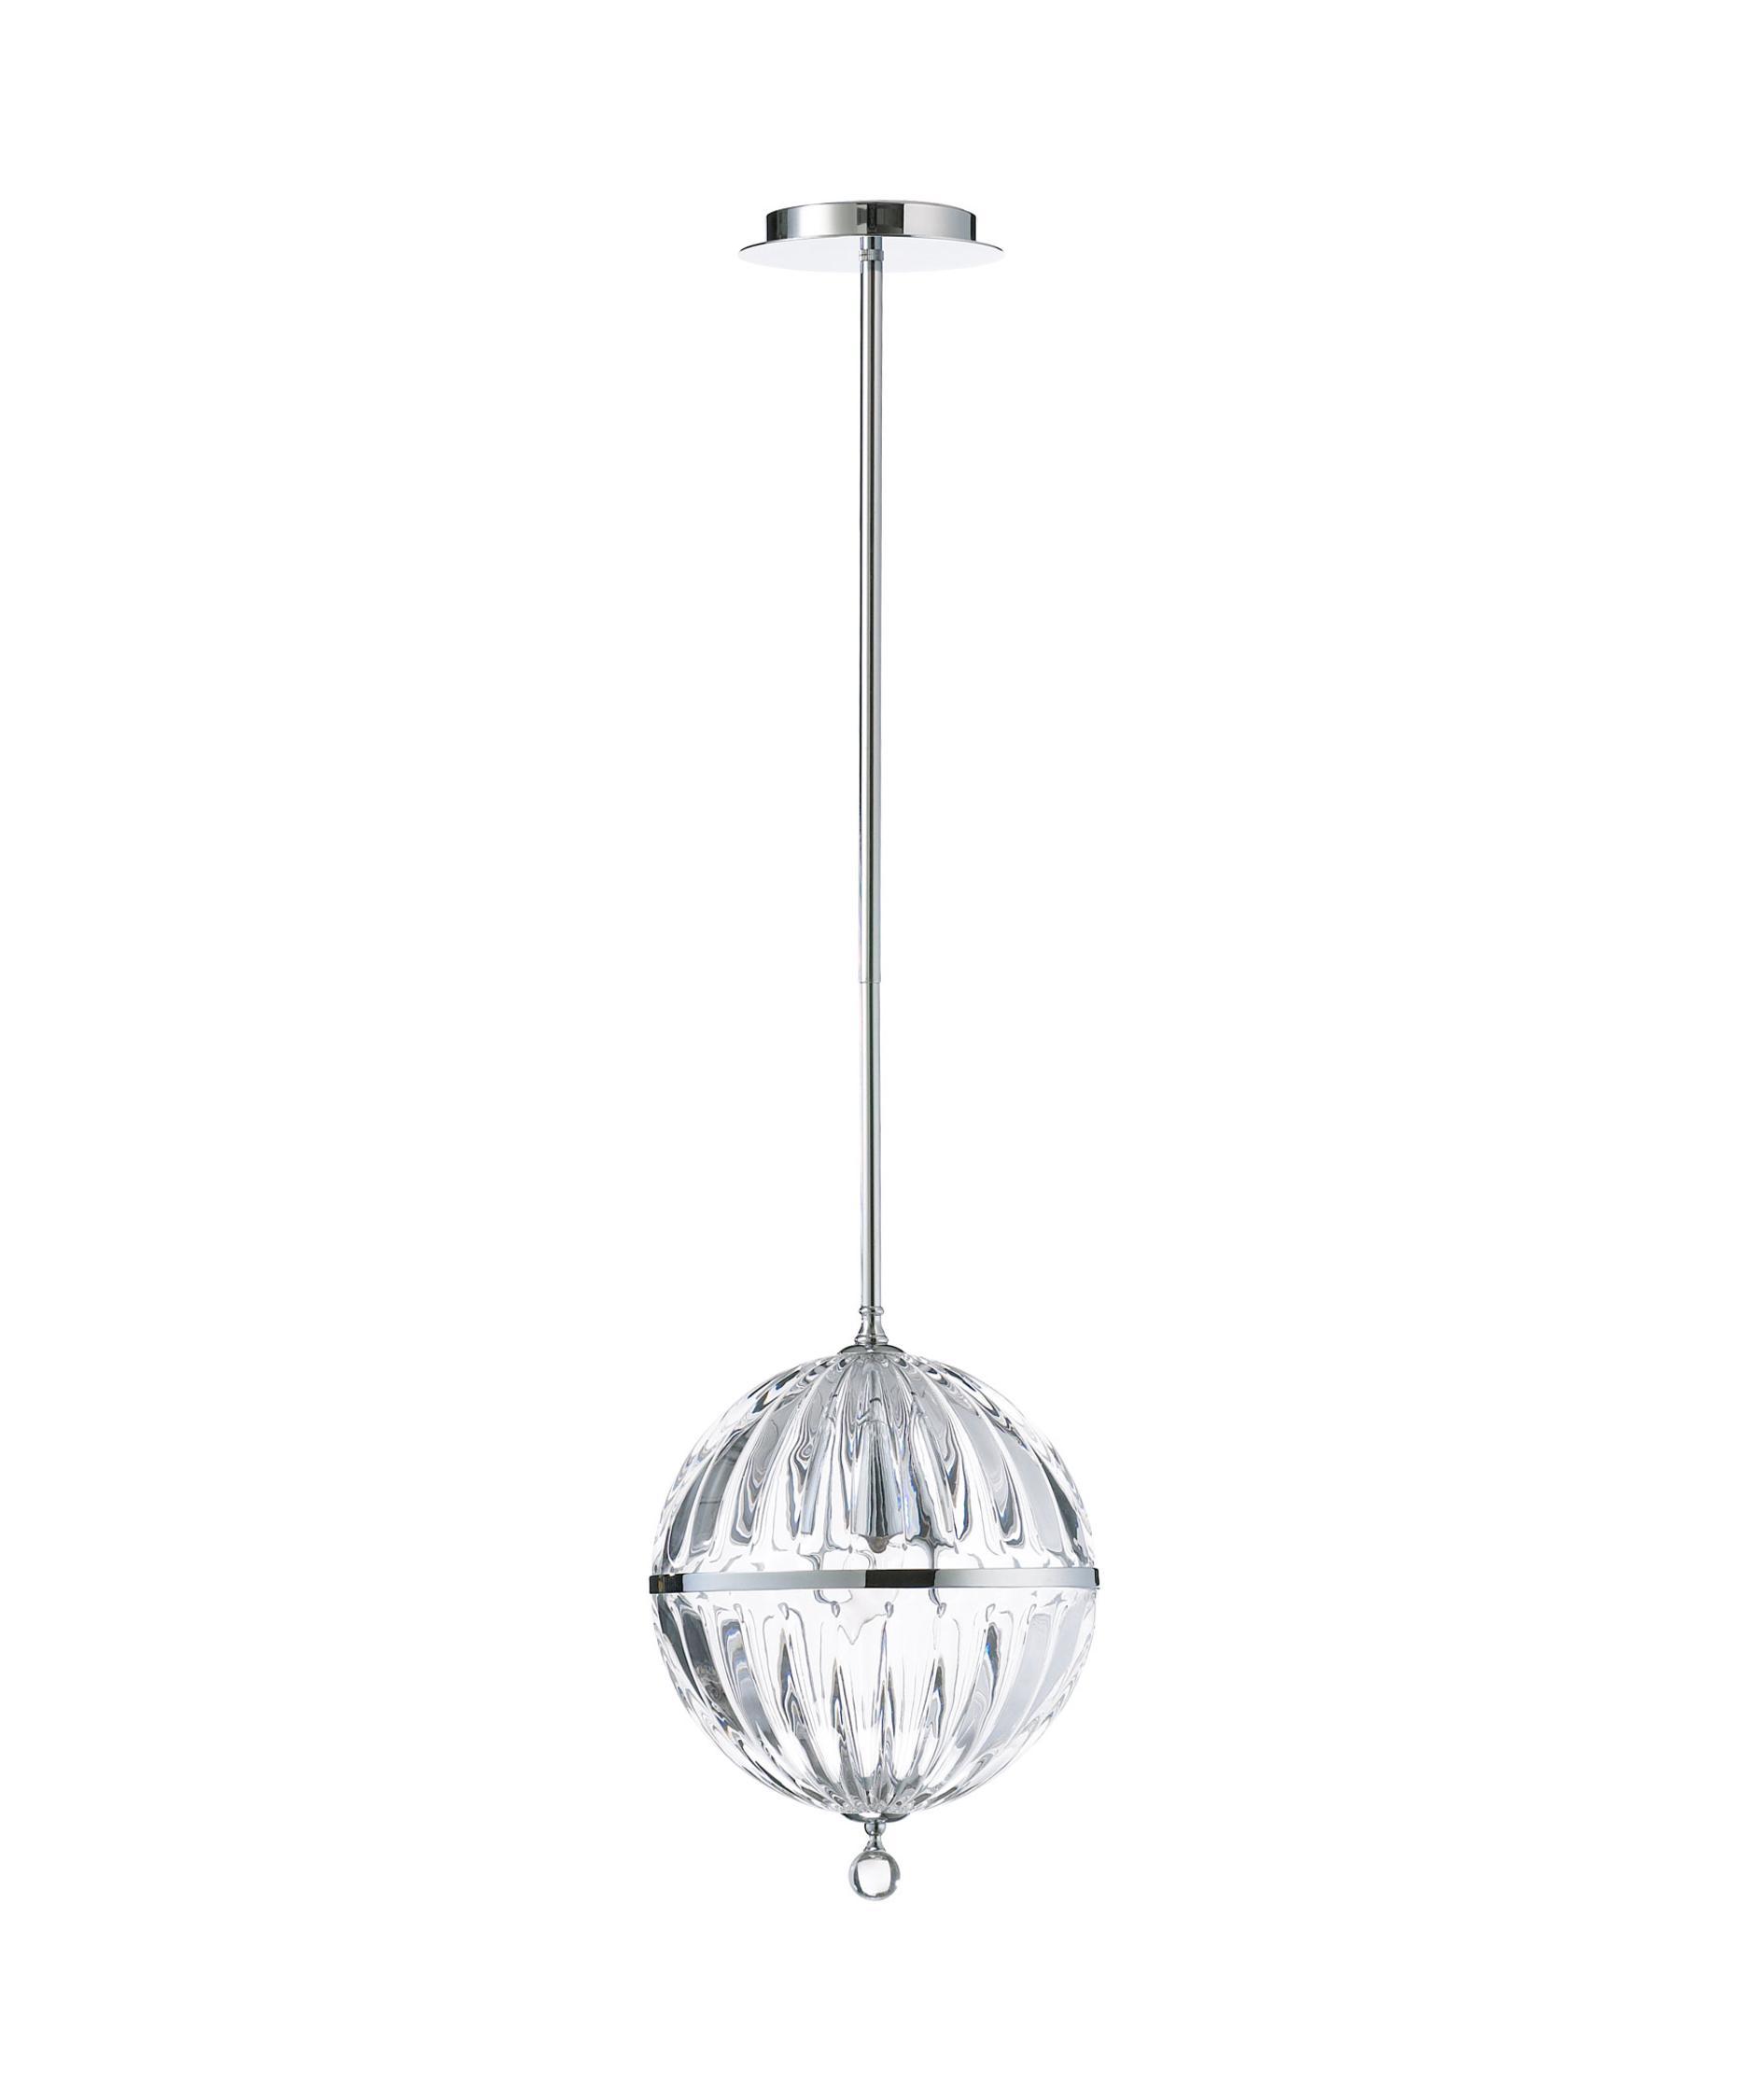 cyan design 04206 janus globe mini pendant capitol. Black Bedroom Furniture Sets. Home Design Ideas